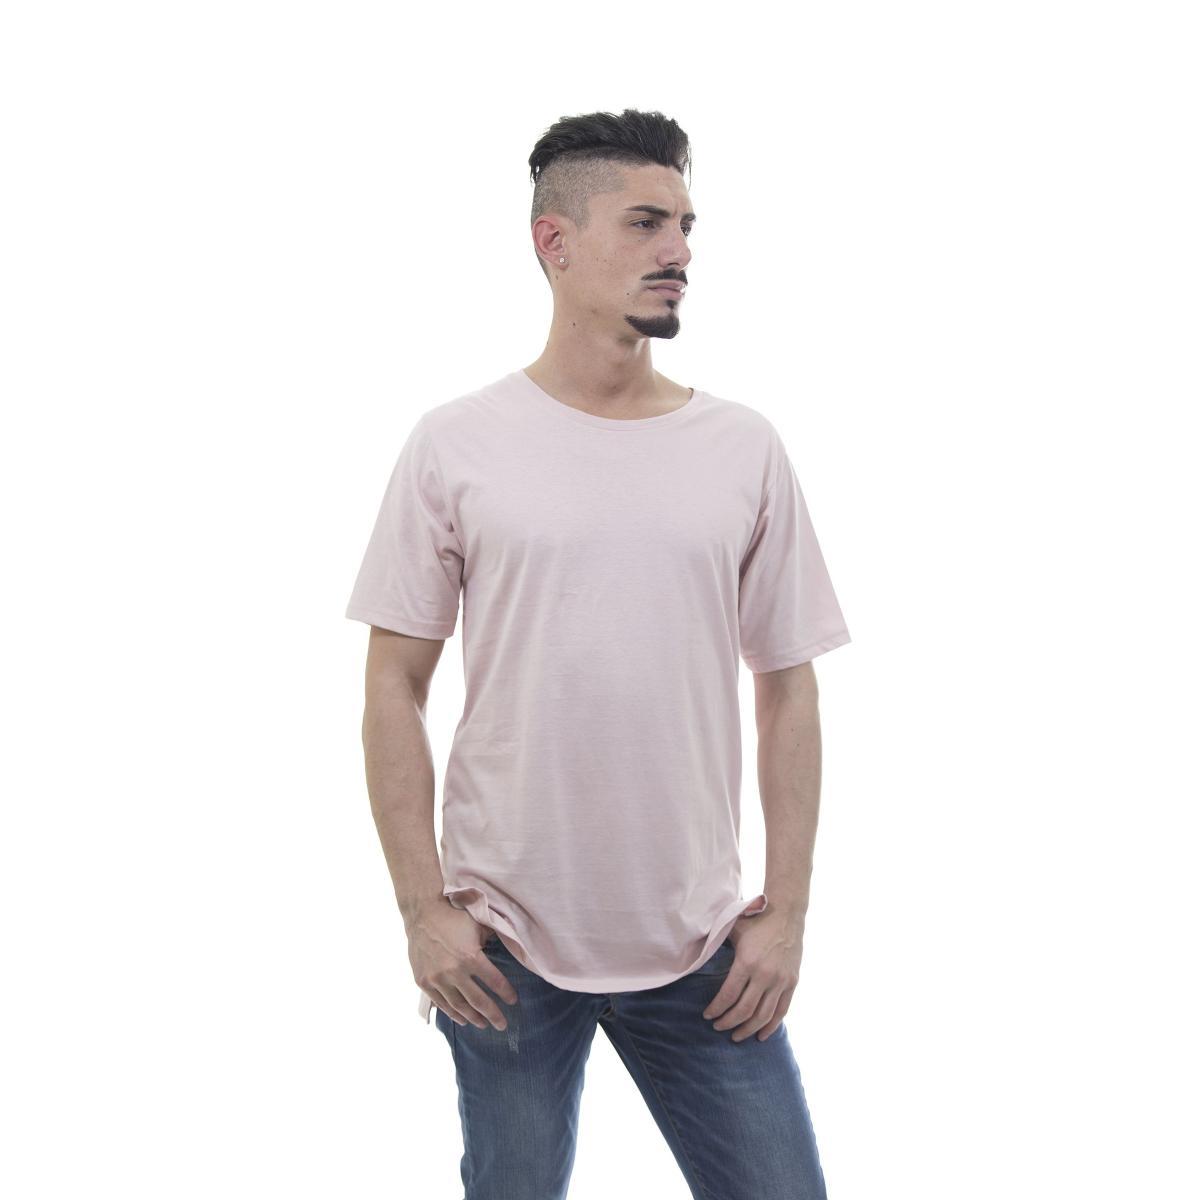 "T-shirt ""Mod"" lunga con spacchi laterali - uomo"